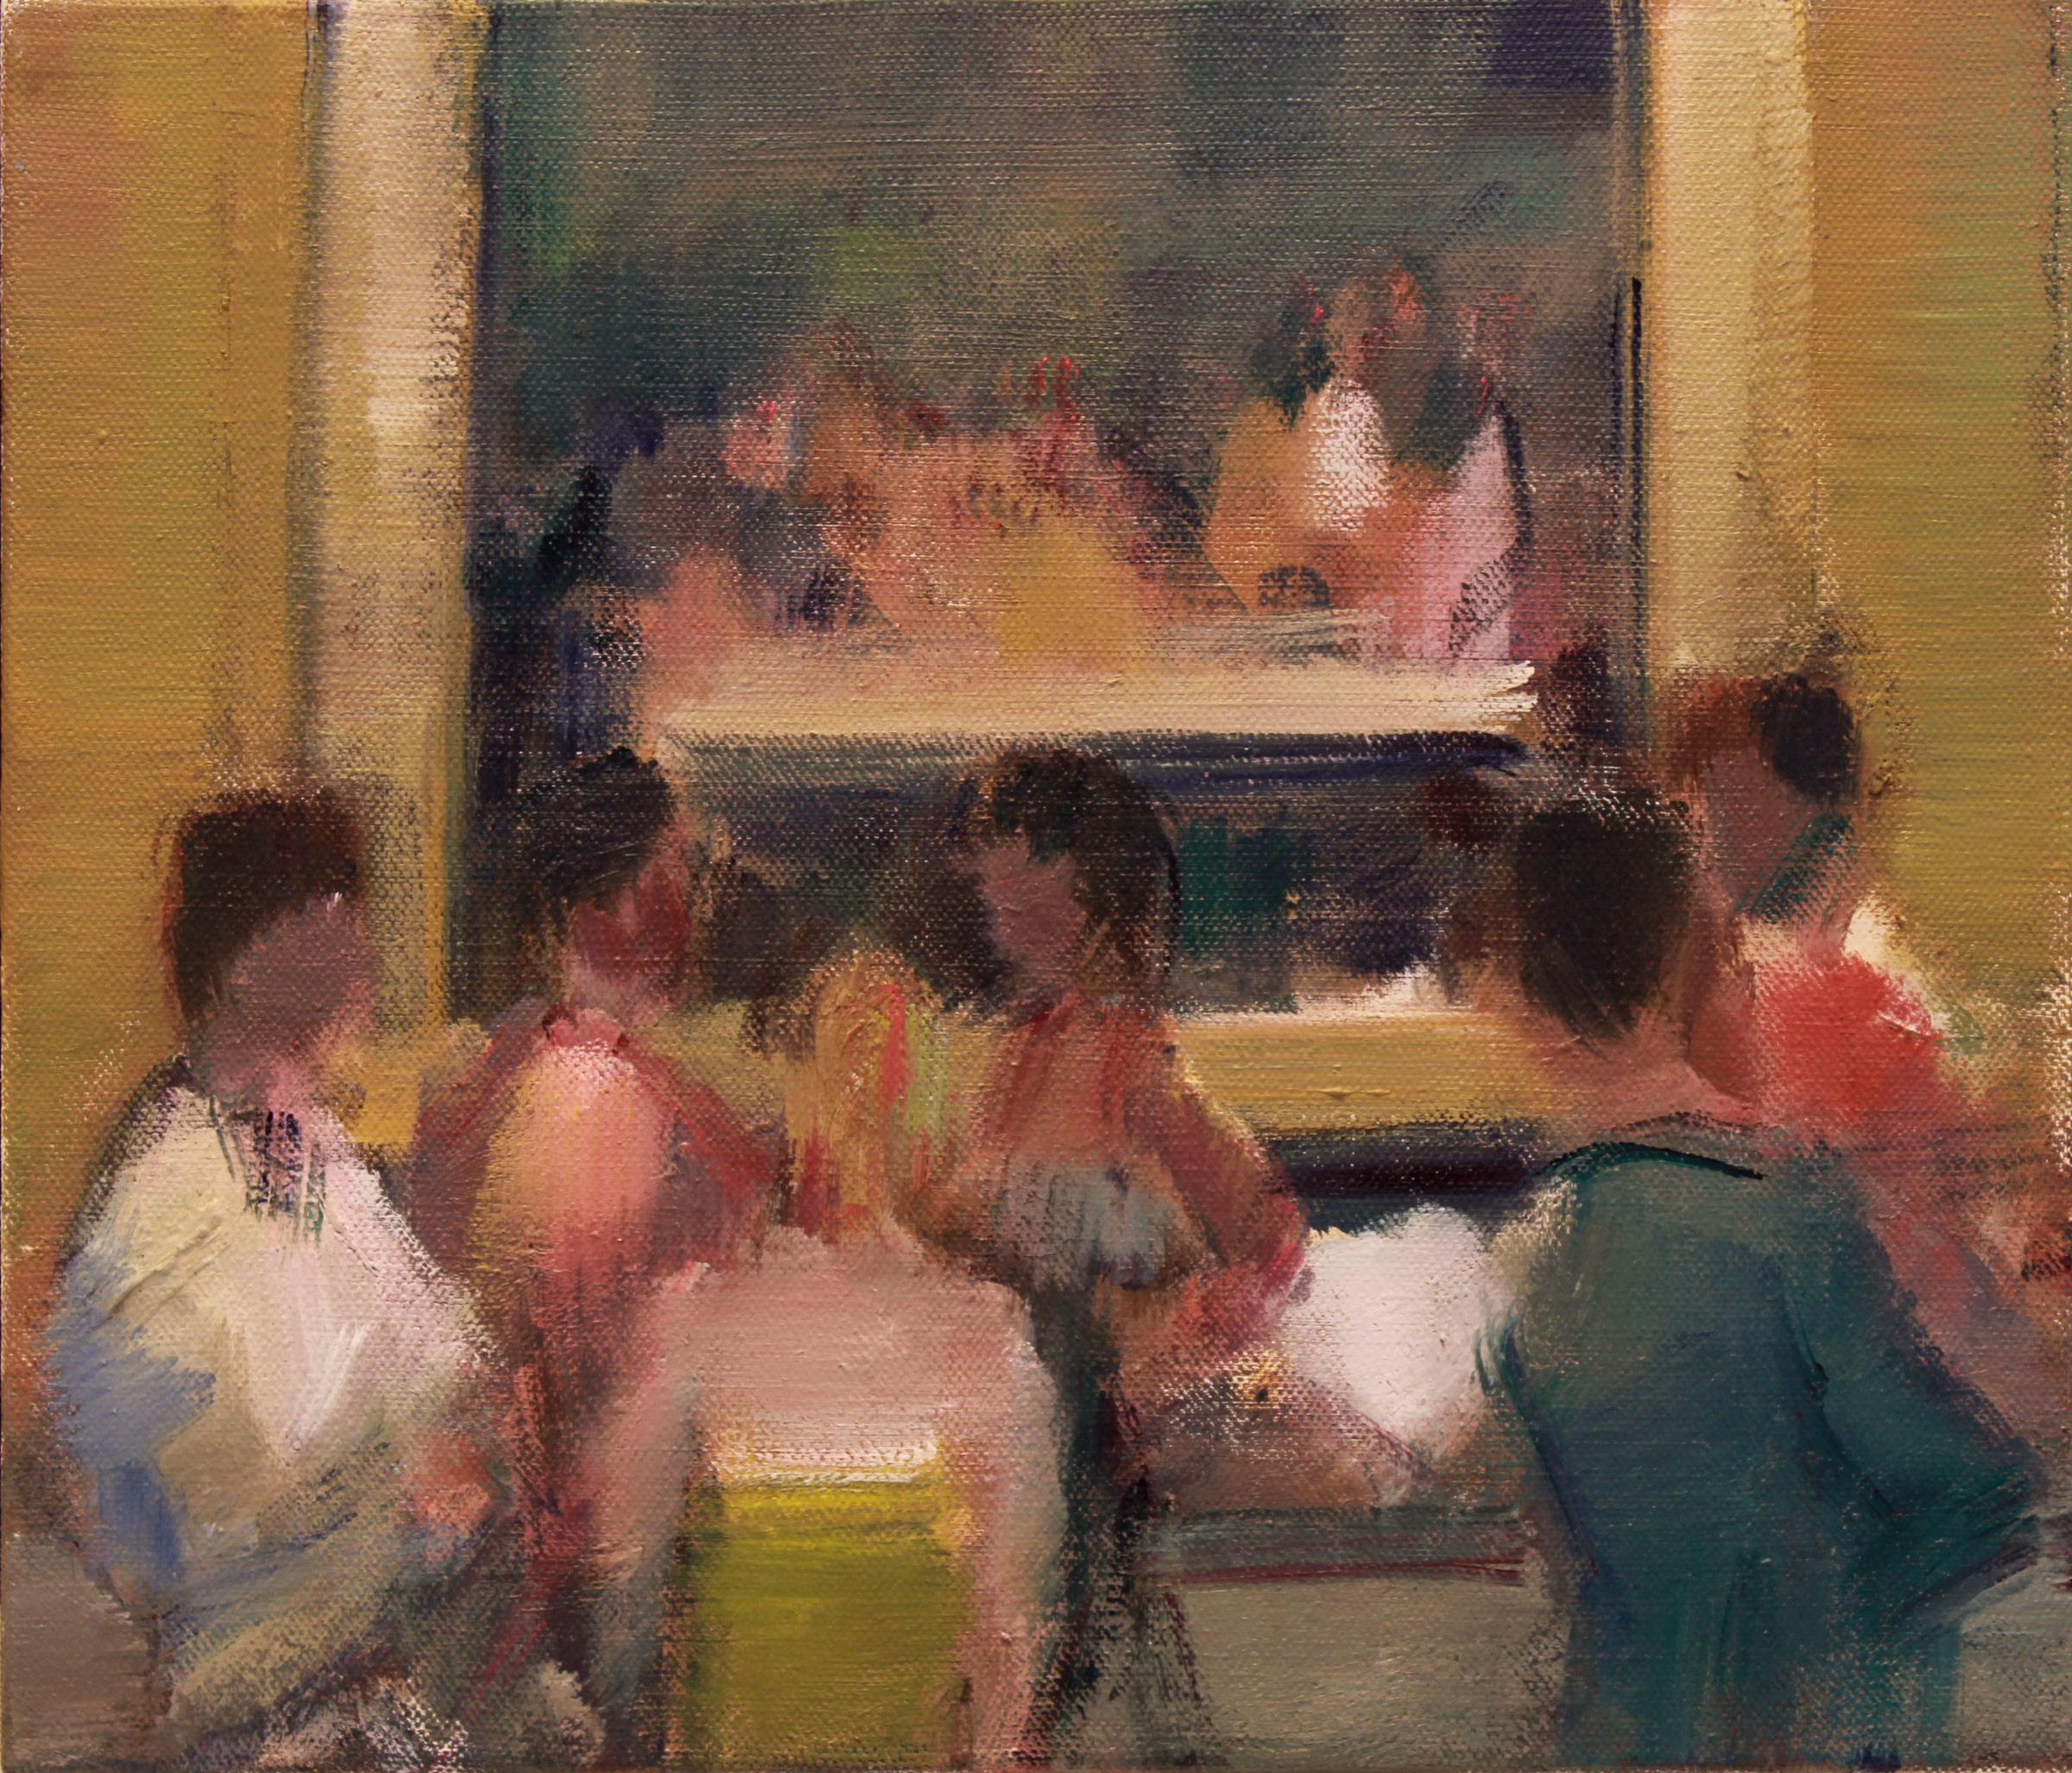 "<span class=""link fancybox-details-link""><a href=""/artists/59-simon-nicholas/works/601-simon-nicholas-gallery/"">View Detail Page</a></span><div class=""artist""><strong>Simon Nicholas</strong></div> <div class=""title""><em>Gallery</em></div> <div class=""medium"">Oil on Linen</div> <div class=""dimensions"">11 x 13.8 inches<br /> SOLD</div>"